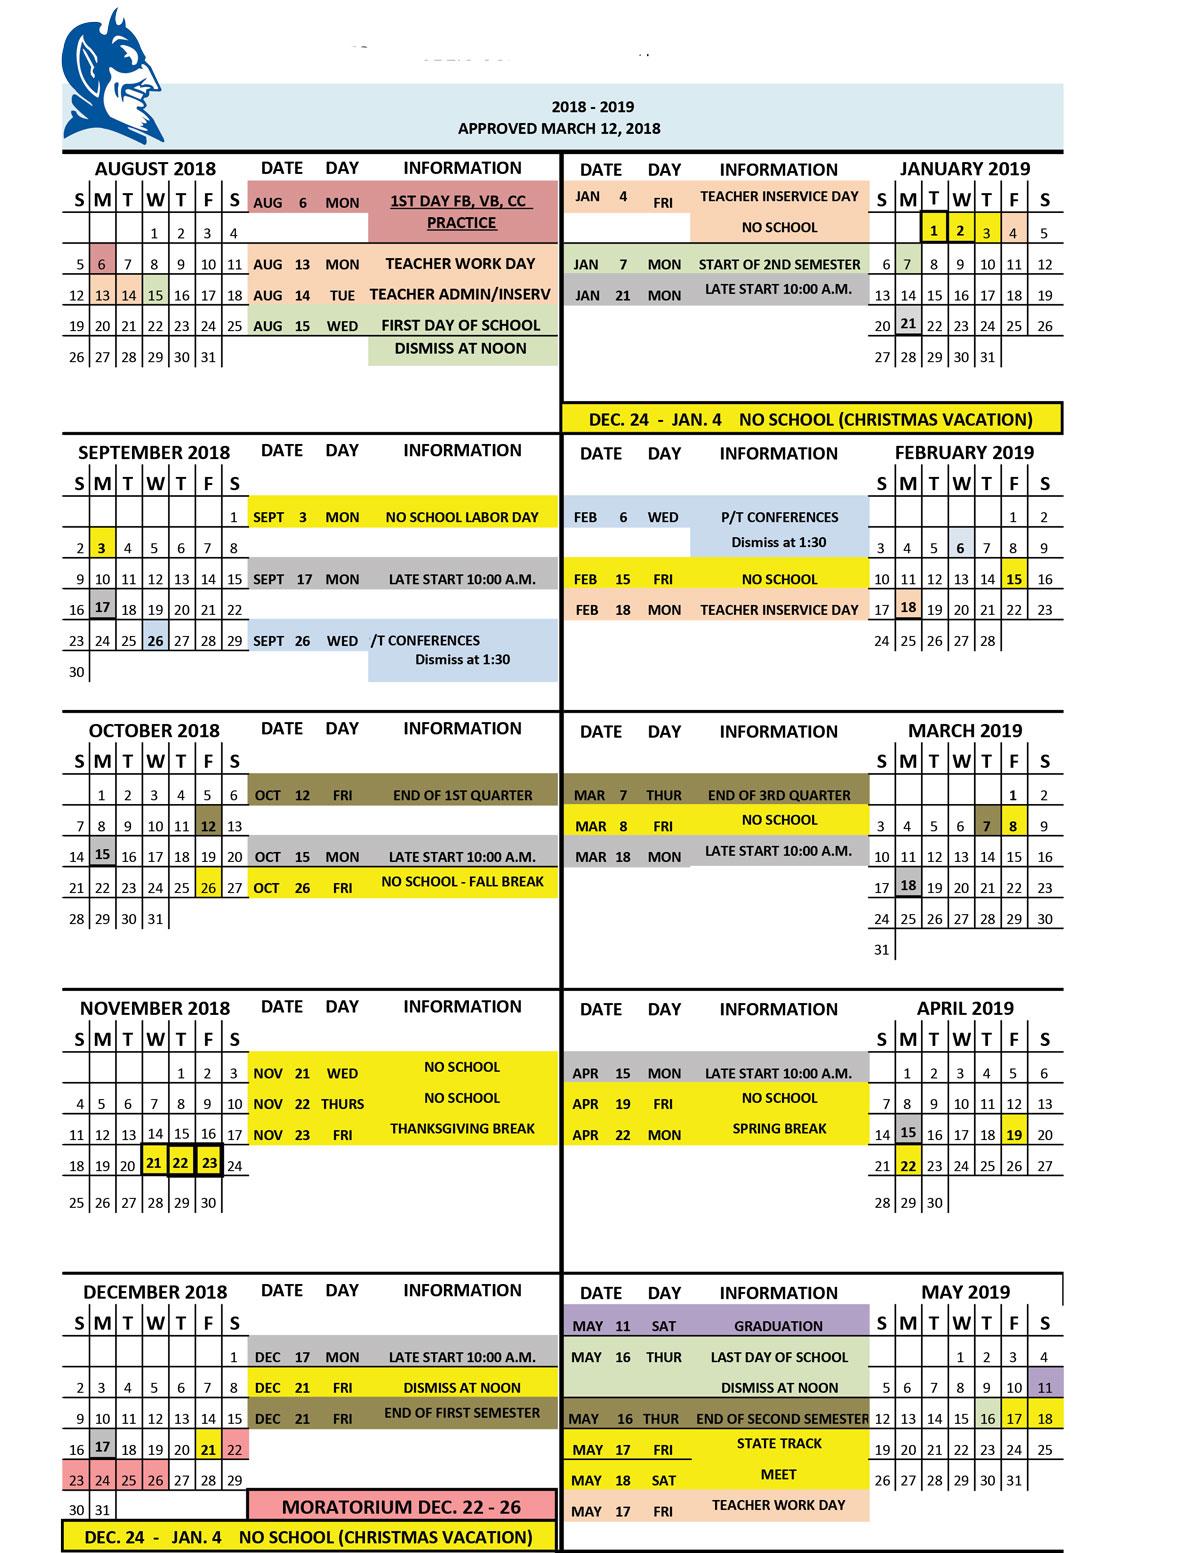 dates of attendance calendar 2018/2019 kenesaw public schools